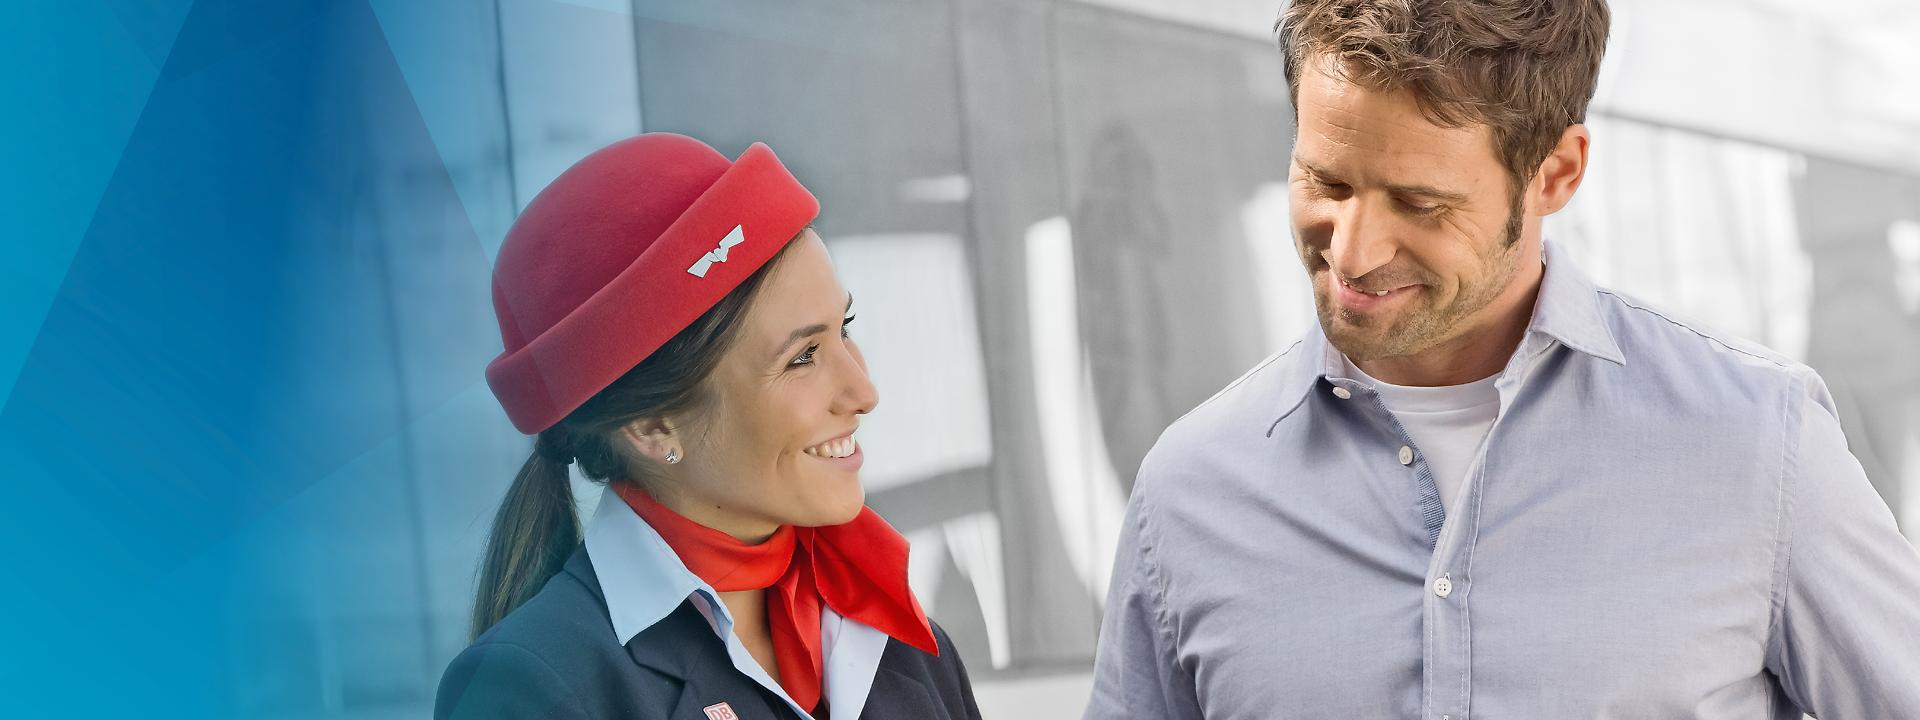 DB Systel Mobile Solutions - DB Mitarbeiterin hilft Reisendem